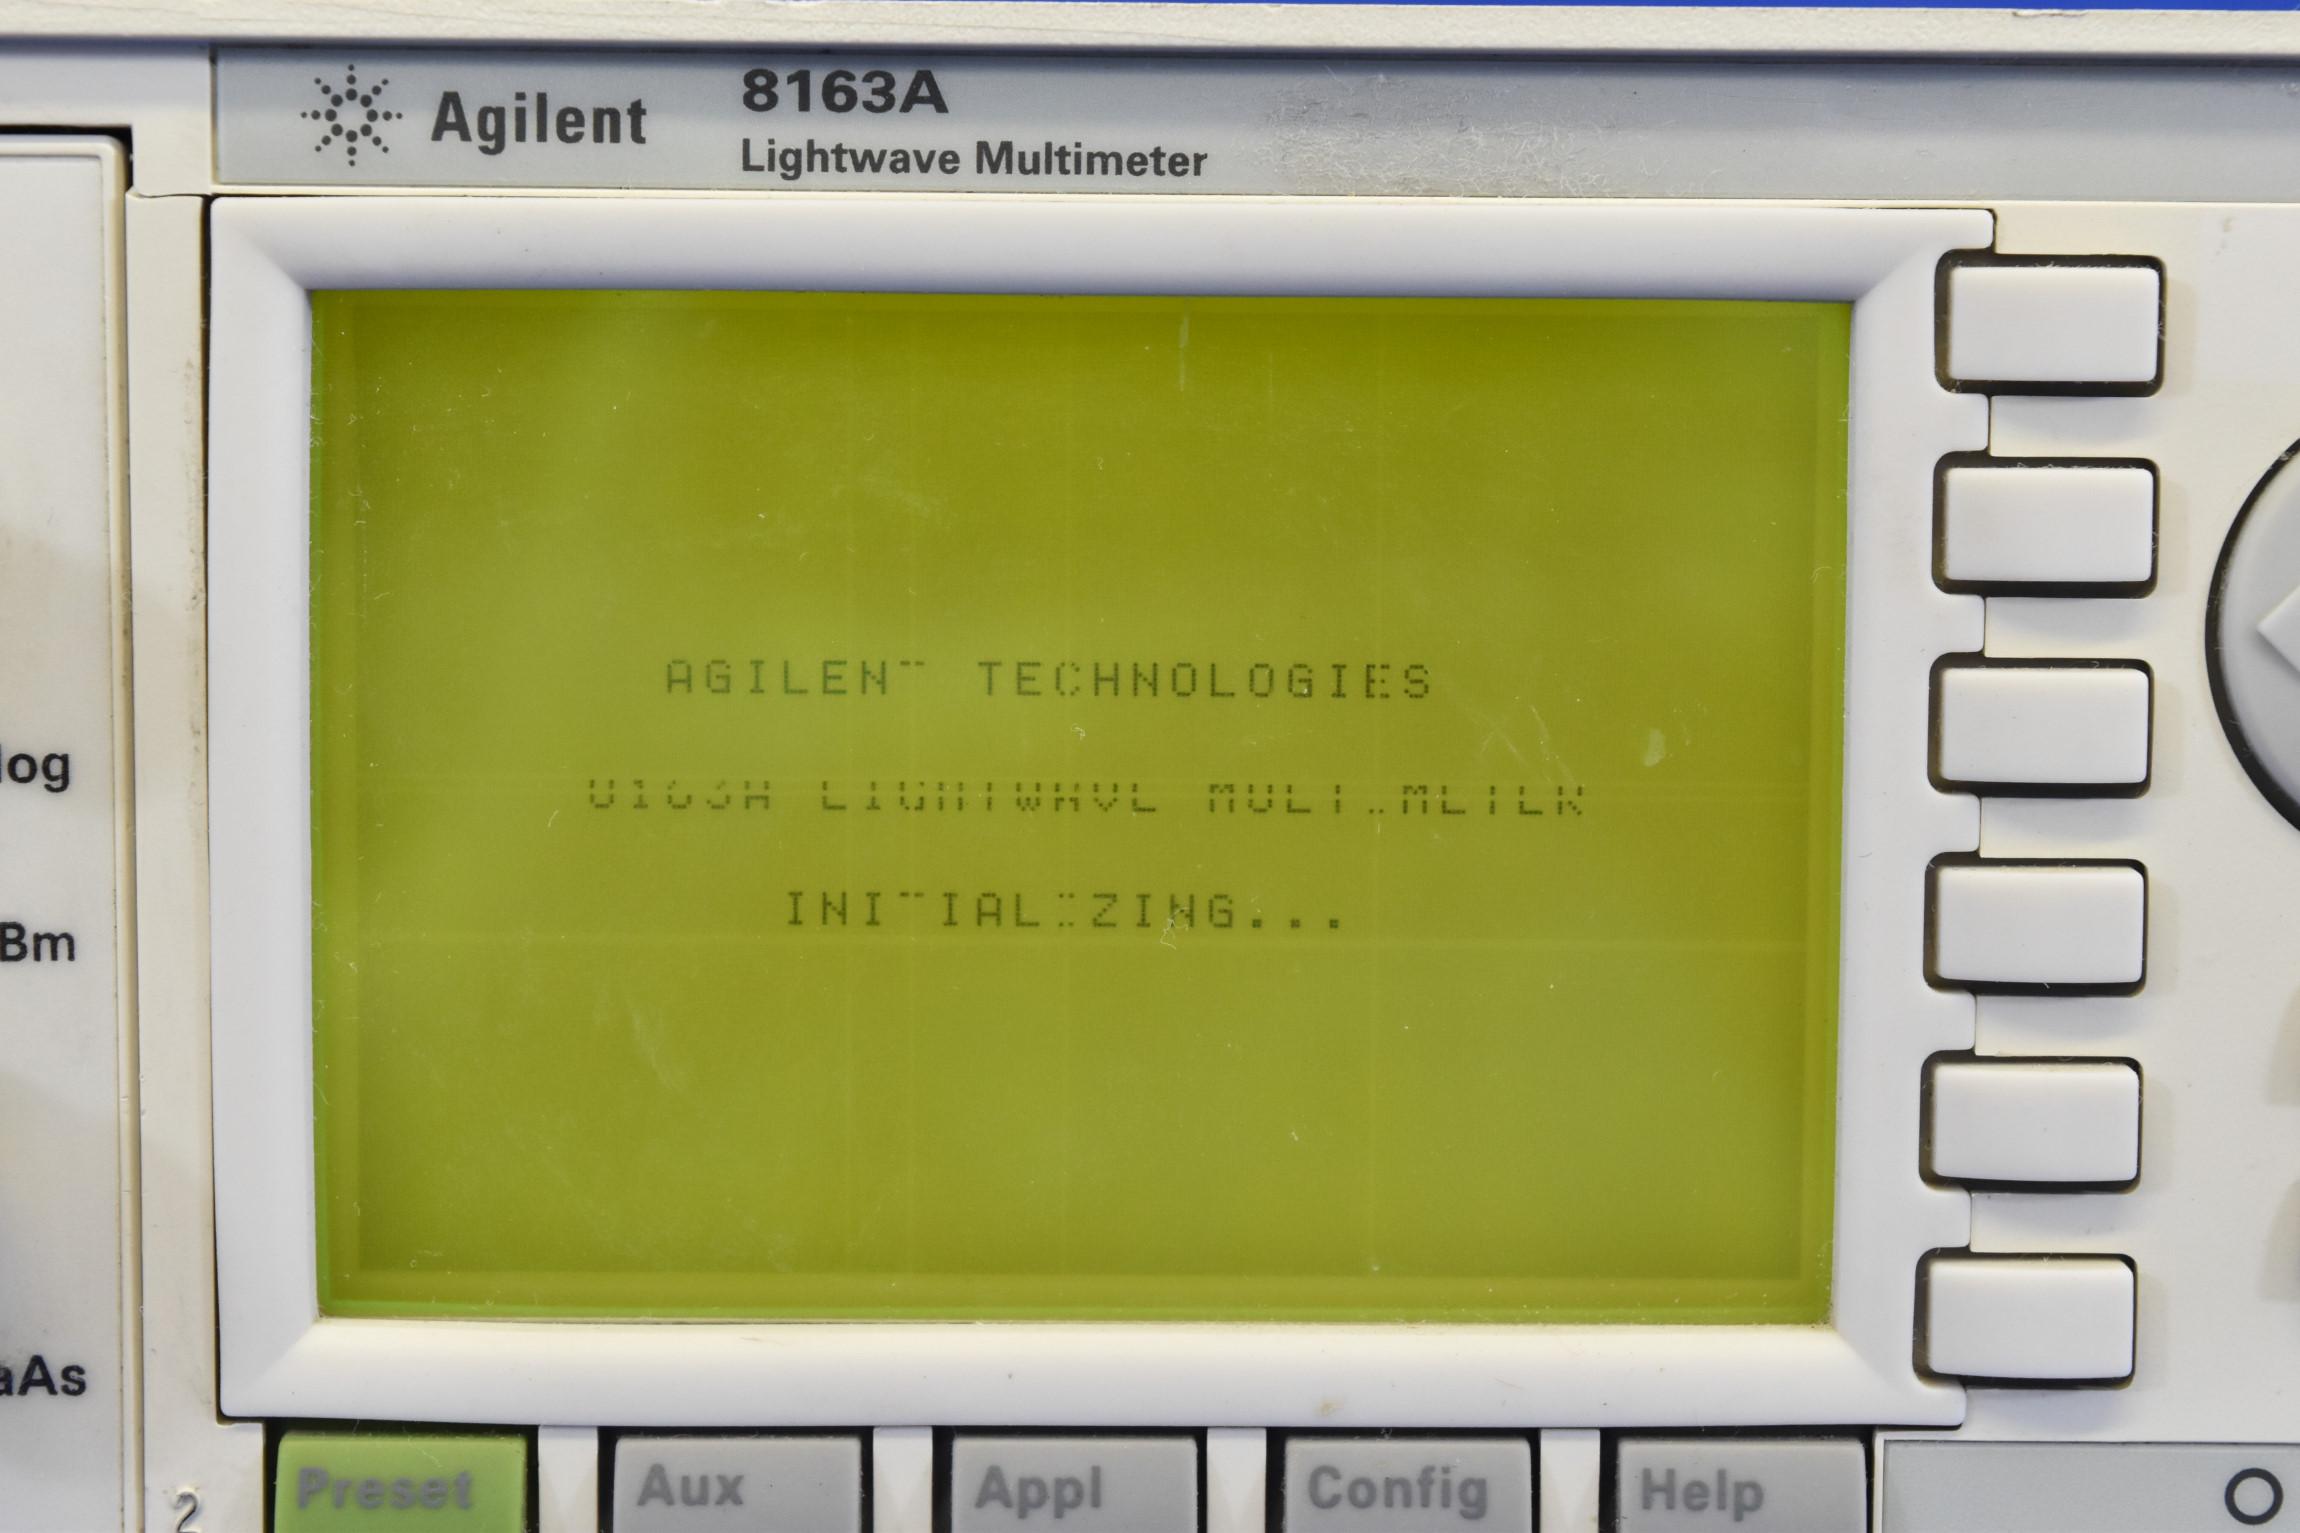 SN 612_002